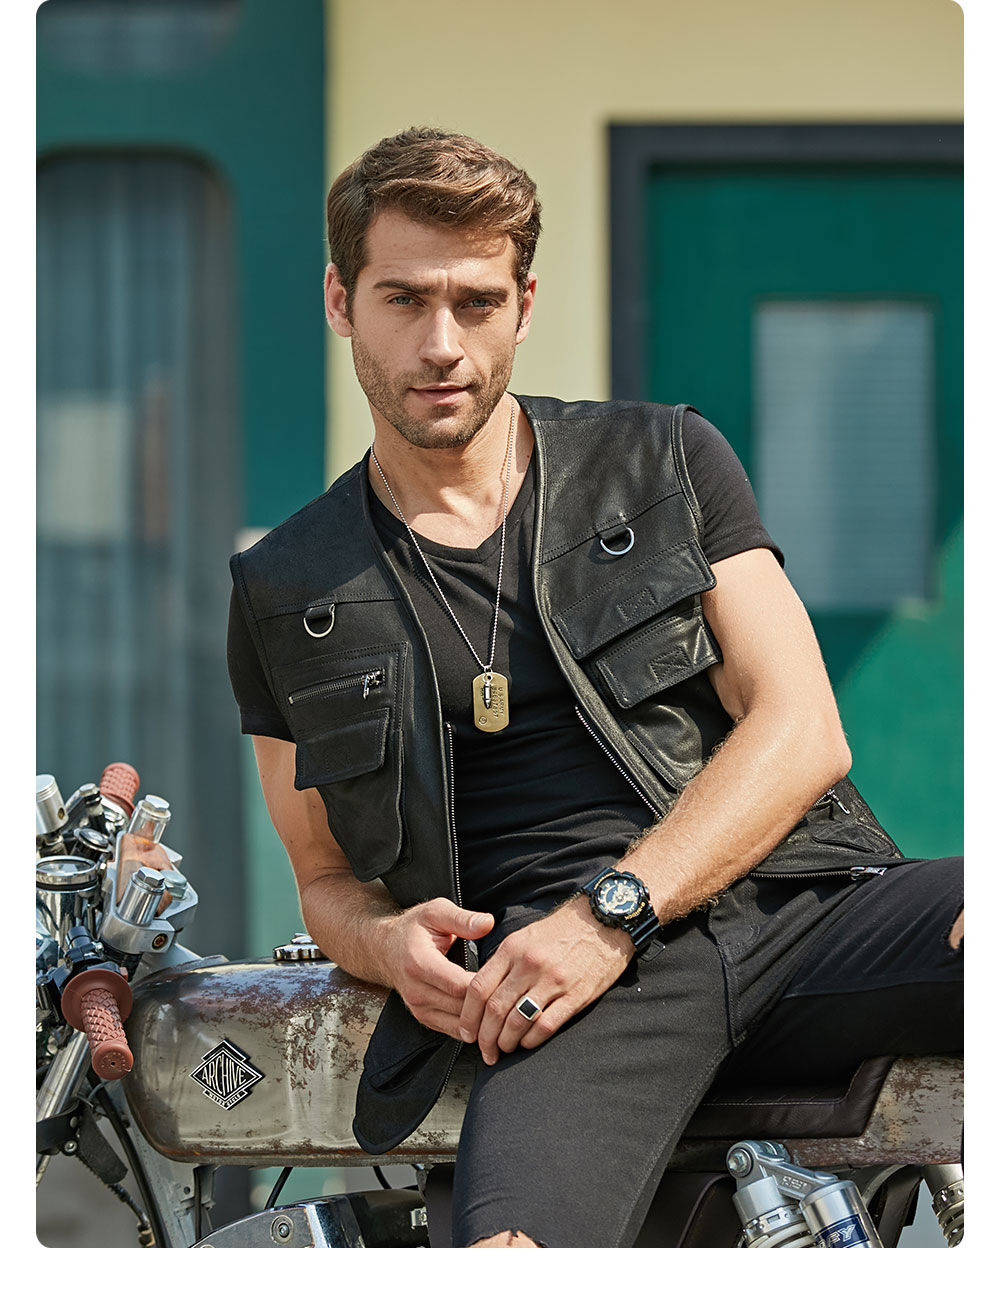 H09ca0bc4b3b047c0b66e4fc09a72ca3fe FLAVOR New Men's Real Leather Vest Men's Motorcycle Fishing Outdoor Travel Vests